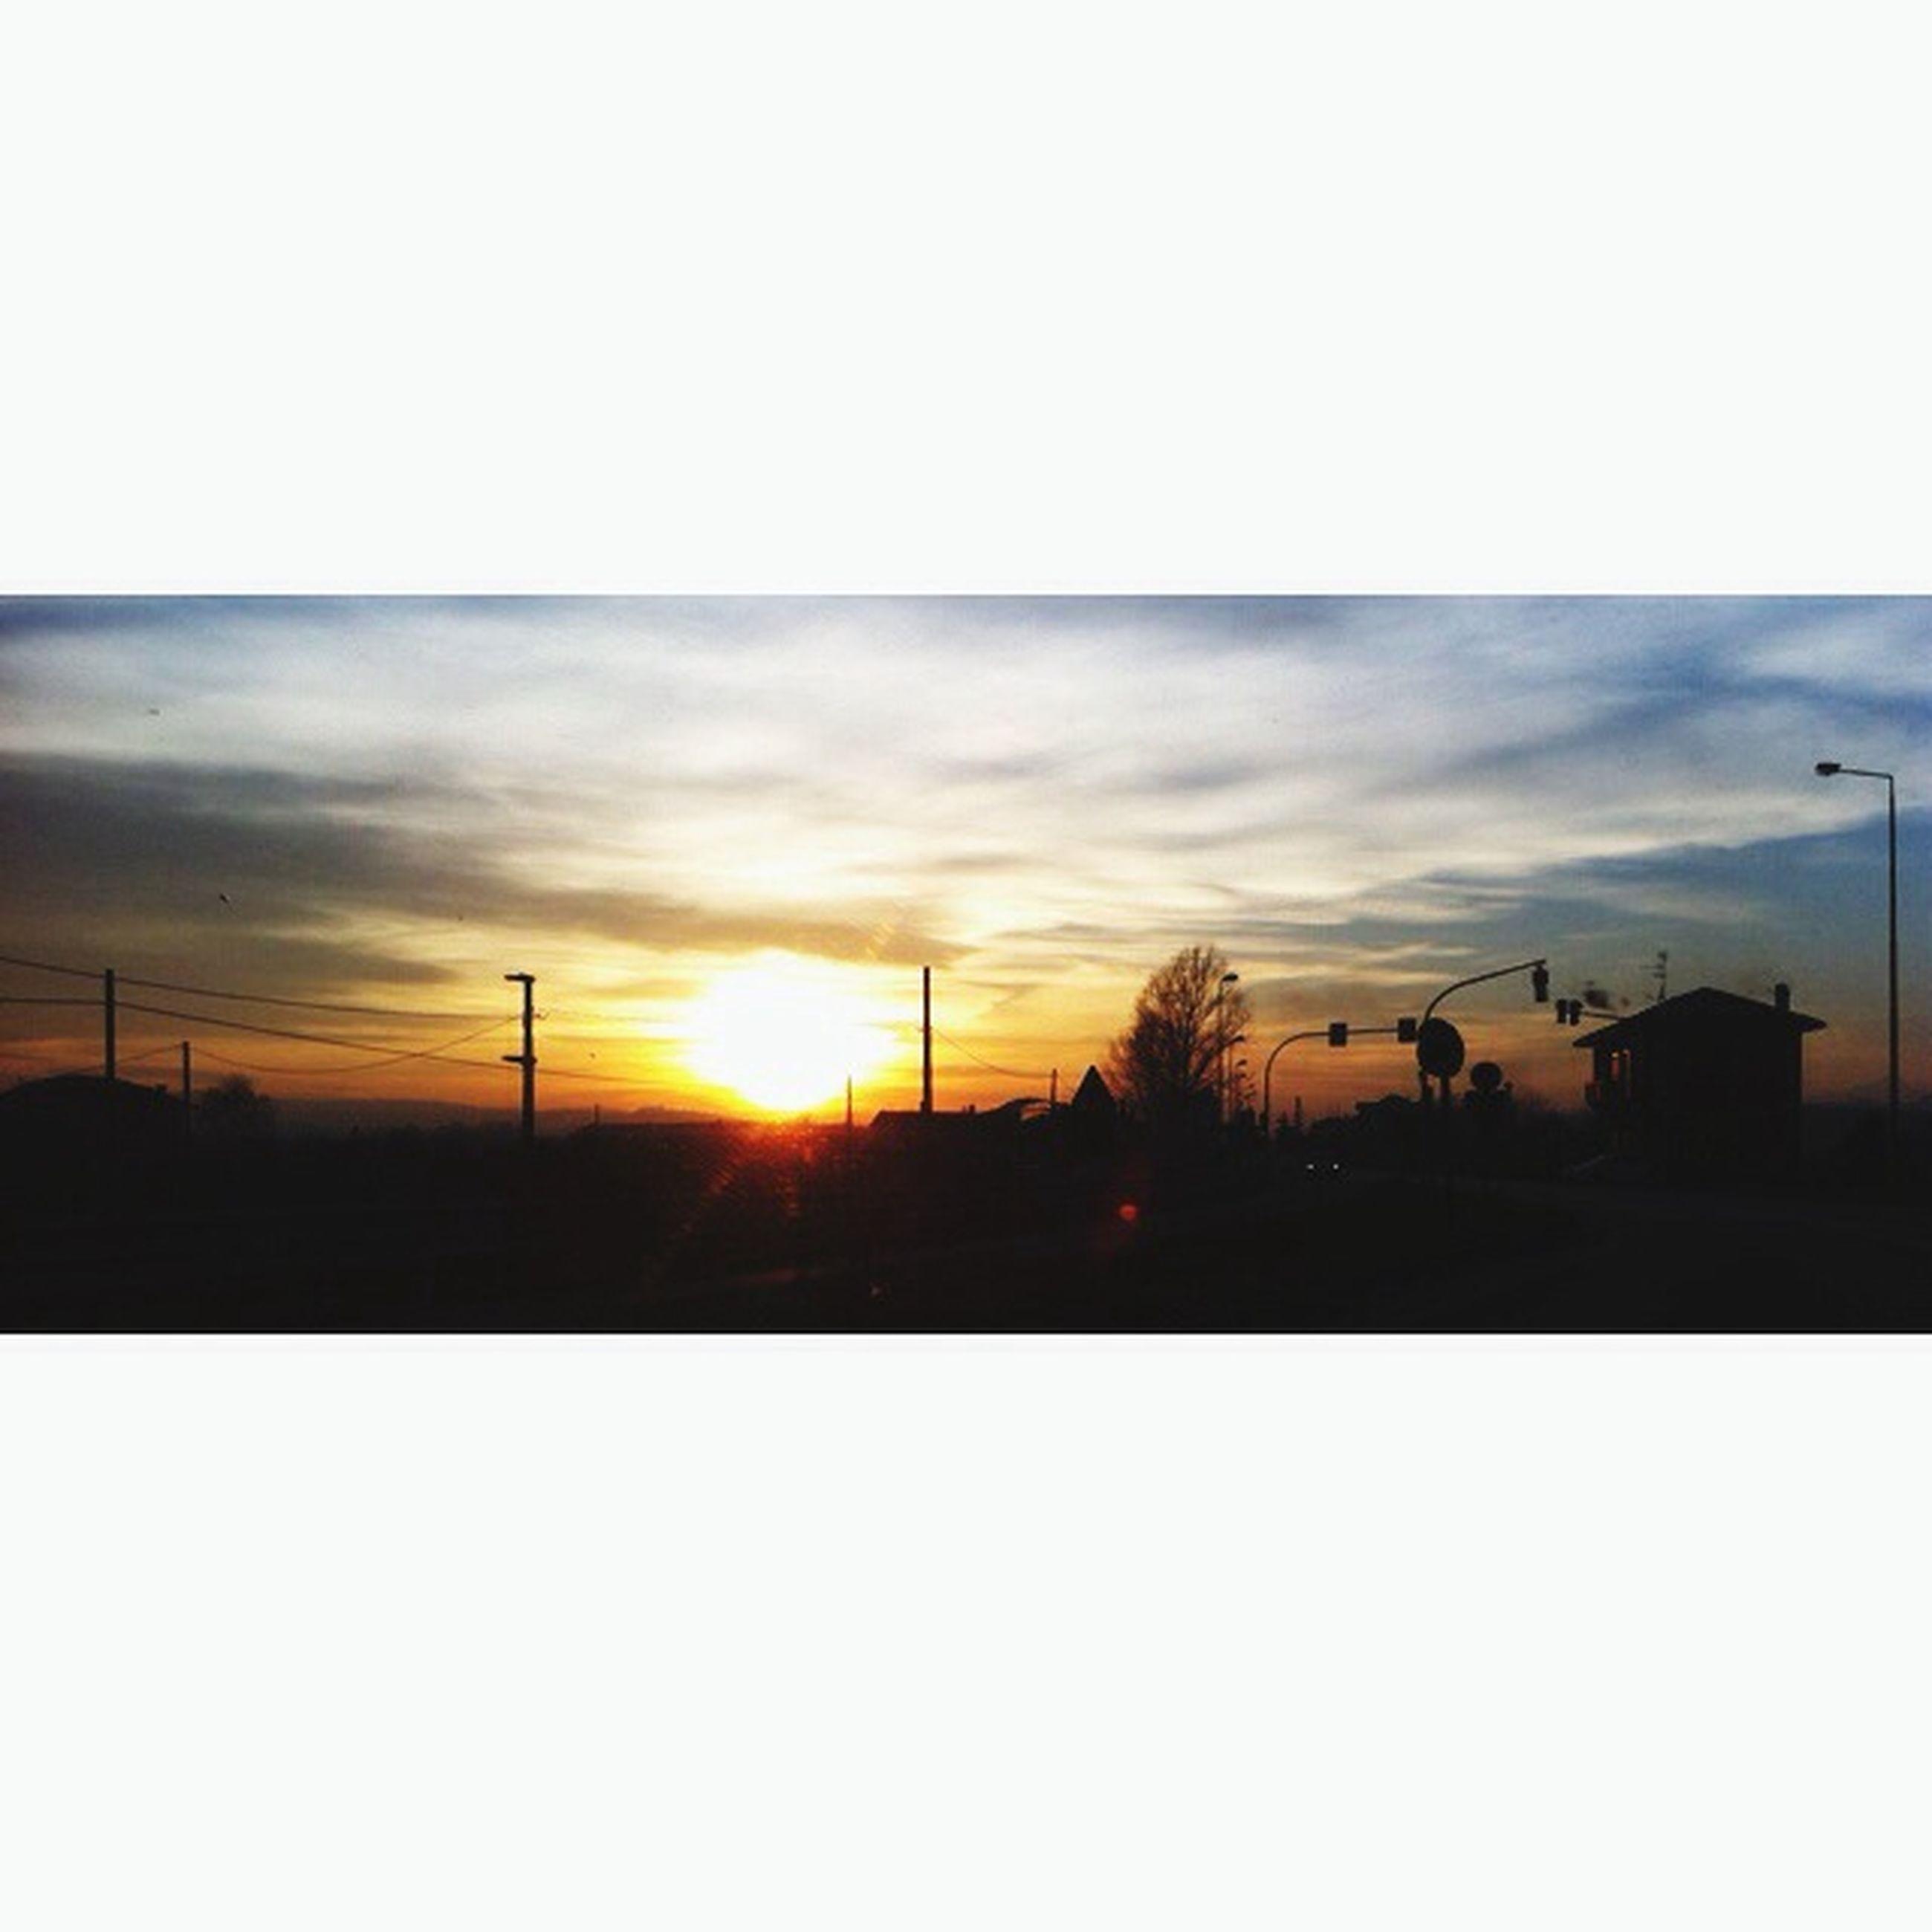 sunset, silhouette, sky, sun, tranquil scene, tranquility, scenics, beauty in nature, landscape, orange color, nature, transfer print, copy space, cloud - sky, tree, sunlight, field, idyllic, outdoors, auto post production filter